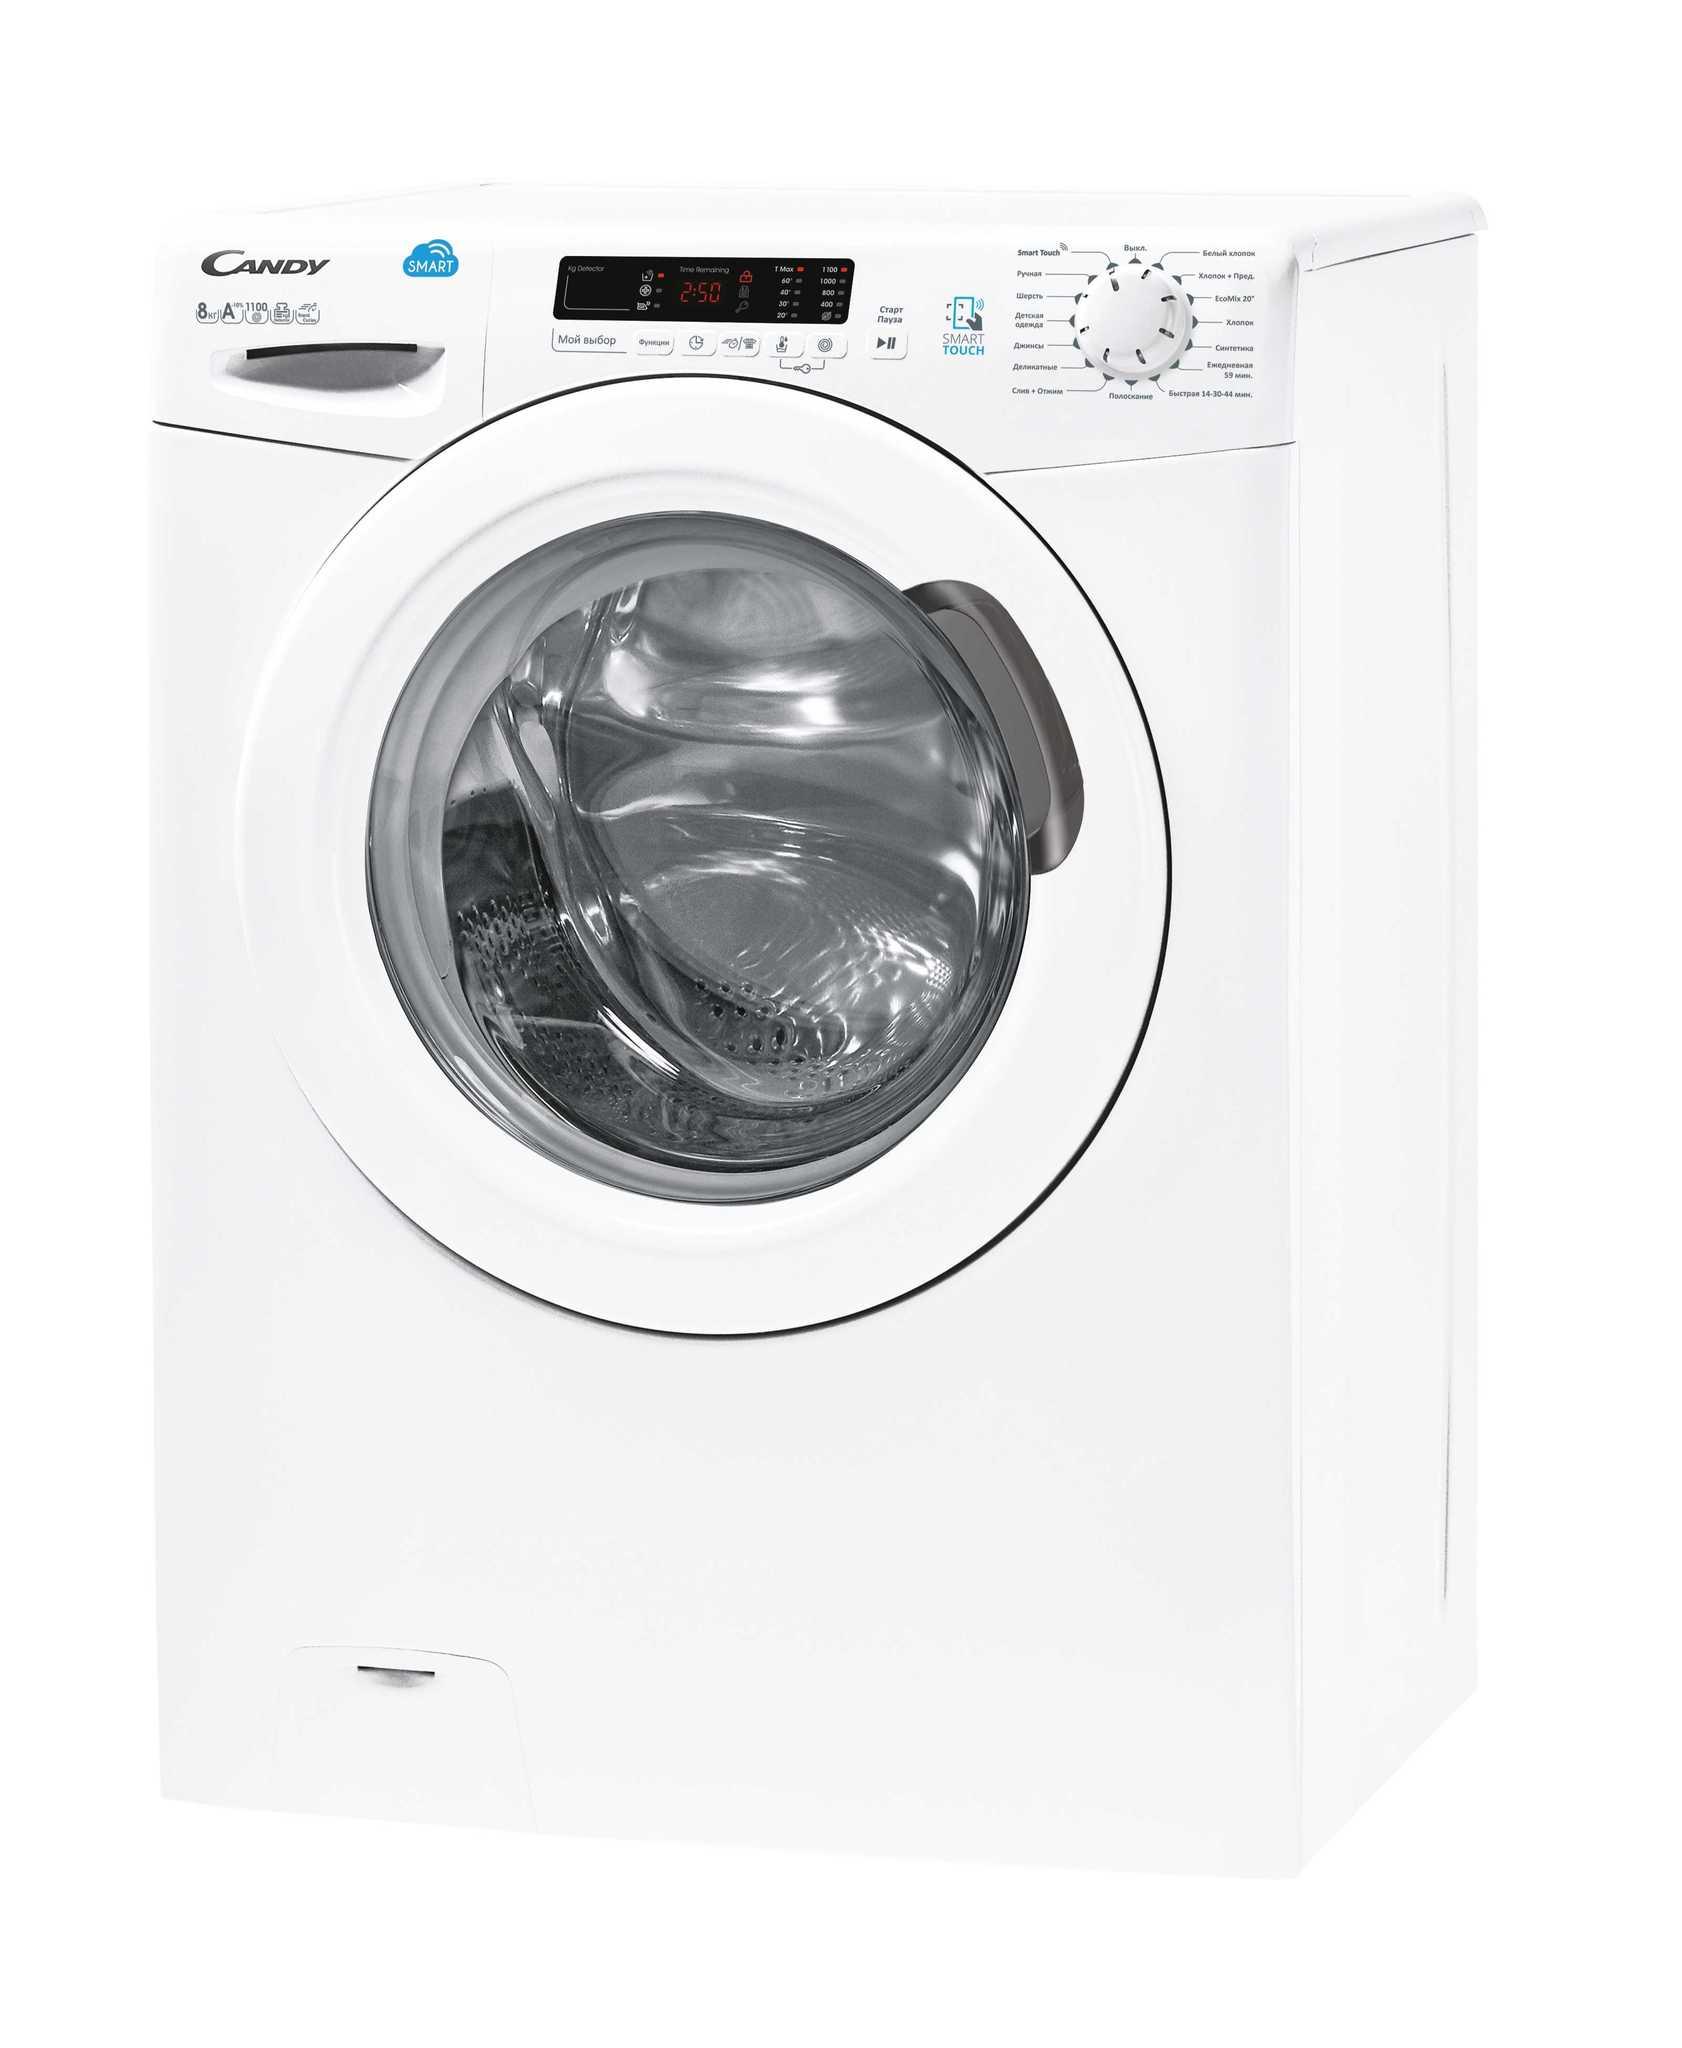 Узкая стиральная машина Candy ACS441182D1/2-07 фото 2